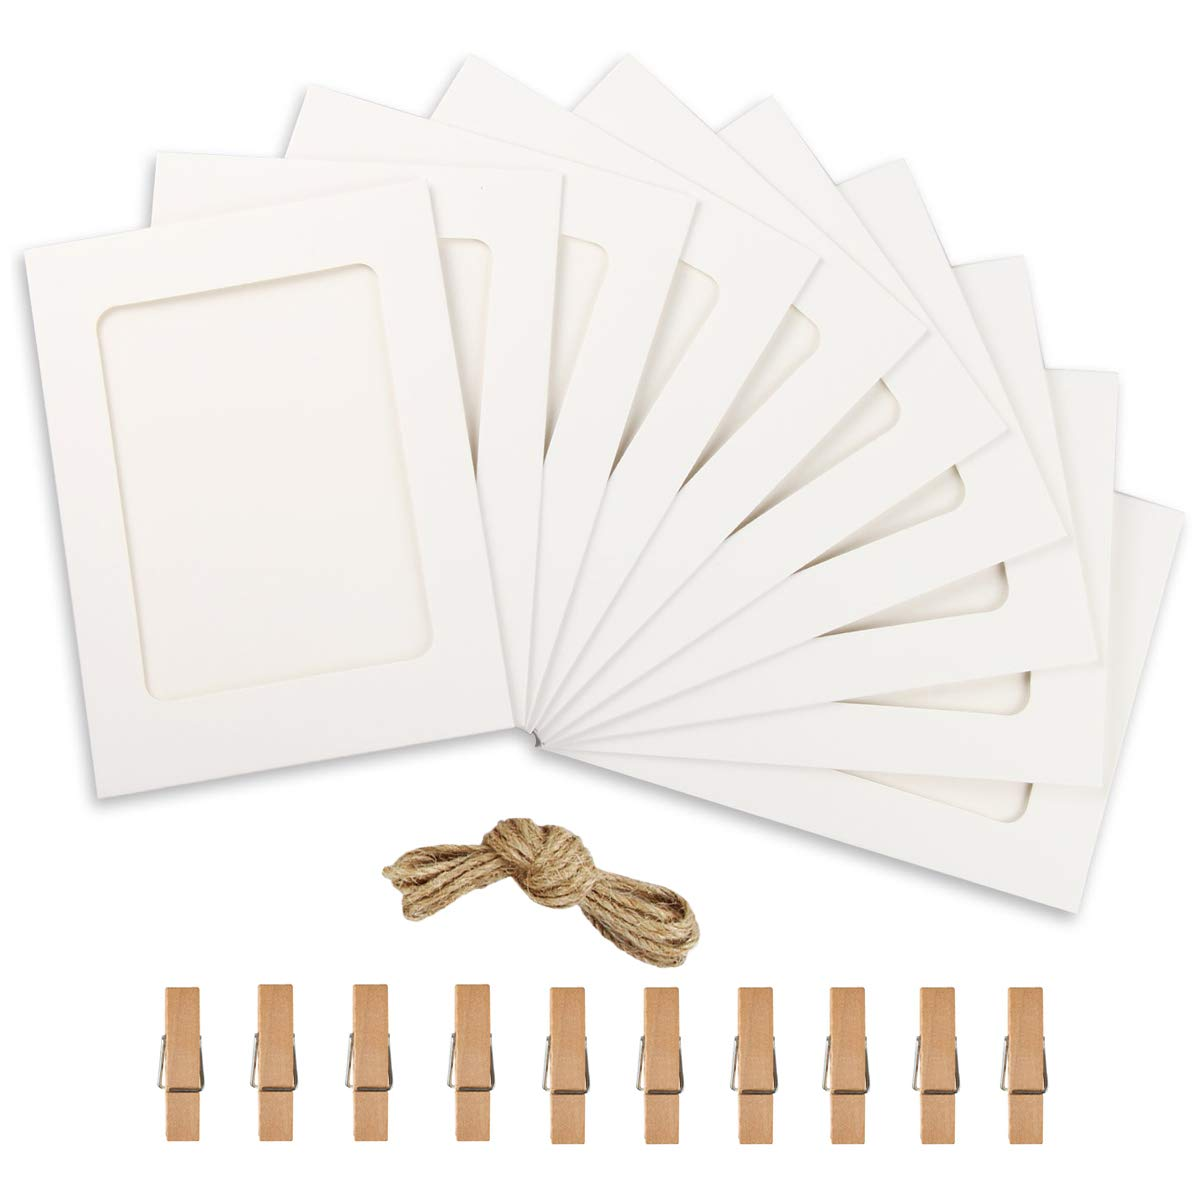 Paper Photo Frame 4x6 Kraft Paper Picture Frames 10 PCS DIY ...